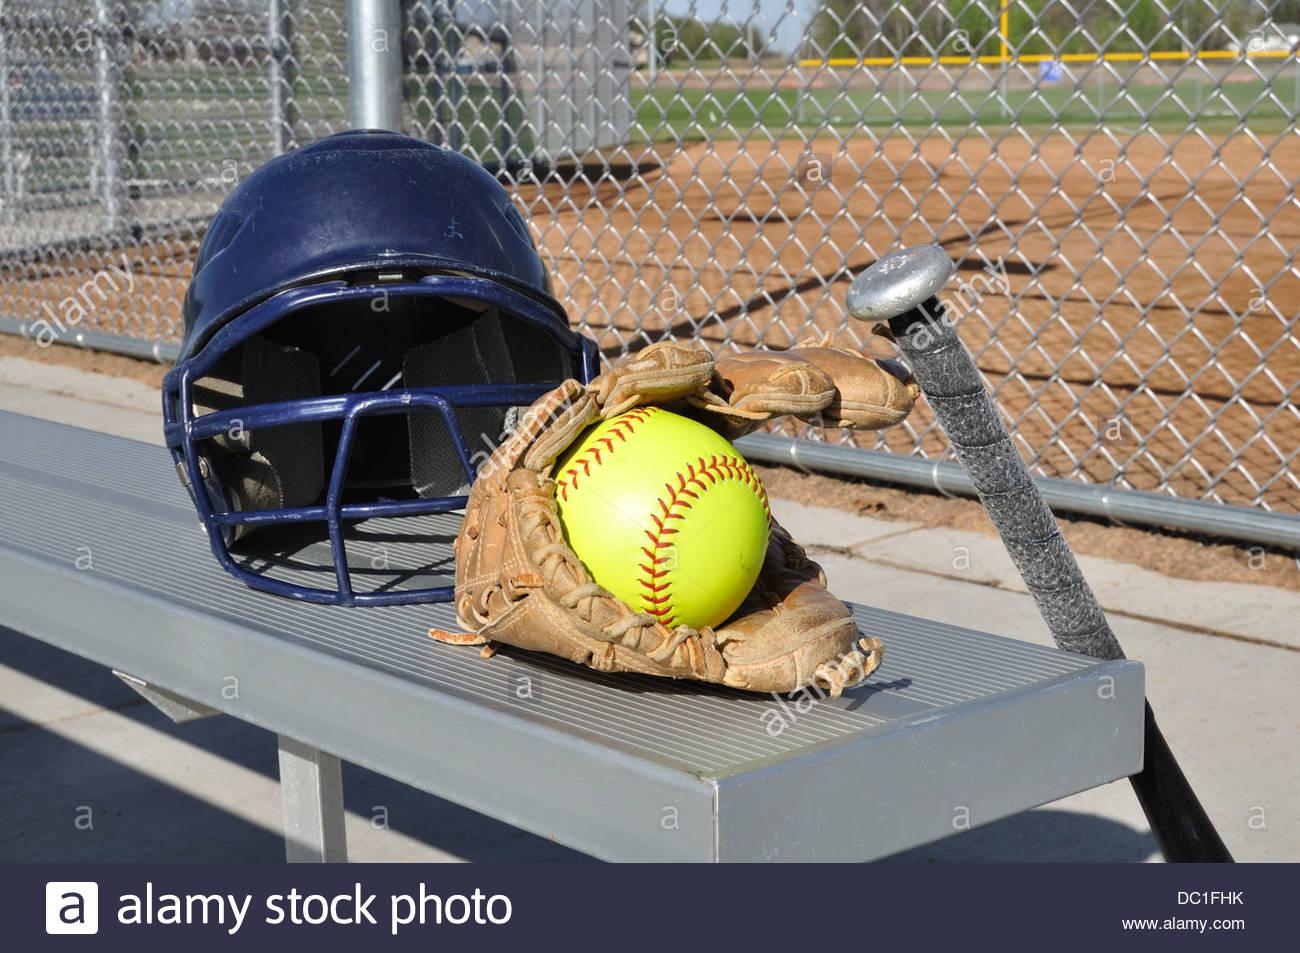 1300x953 Softball Bat Ball Glove Stock Photos Amp Softball Bat Ball Glove